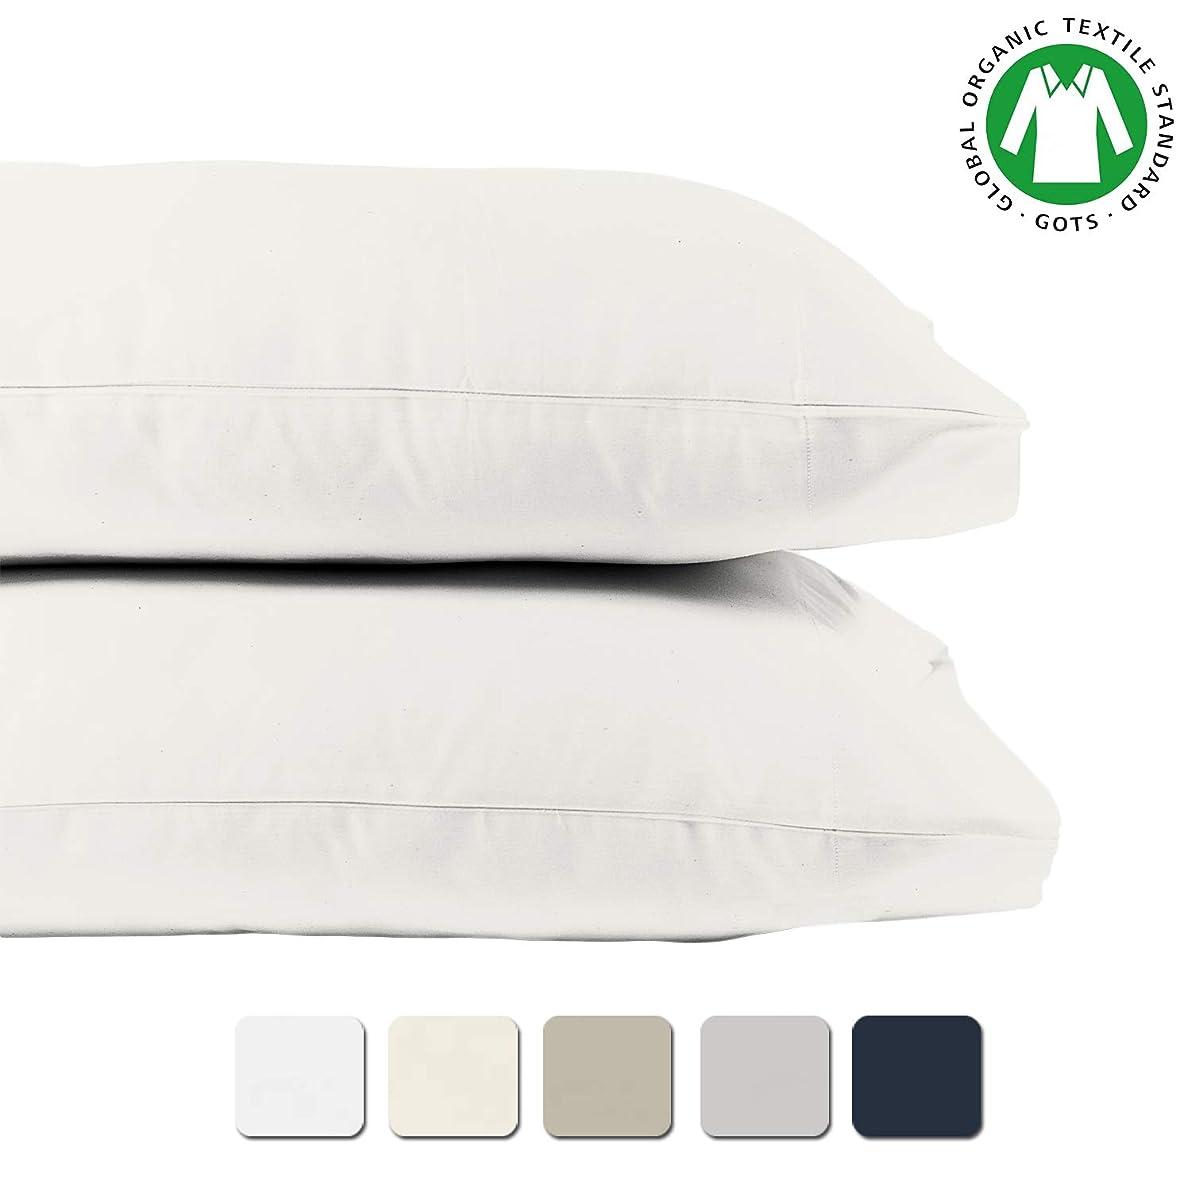 BIOWEAVES 100% Organic Cotton Pillow Case Set 300 Thread Count Sateen Weave GOTS Certified - Standard, Set of 2, White